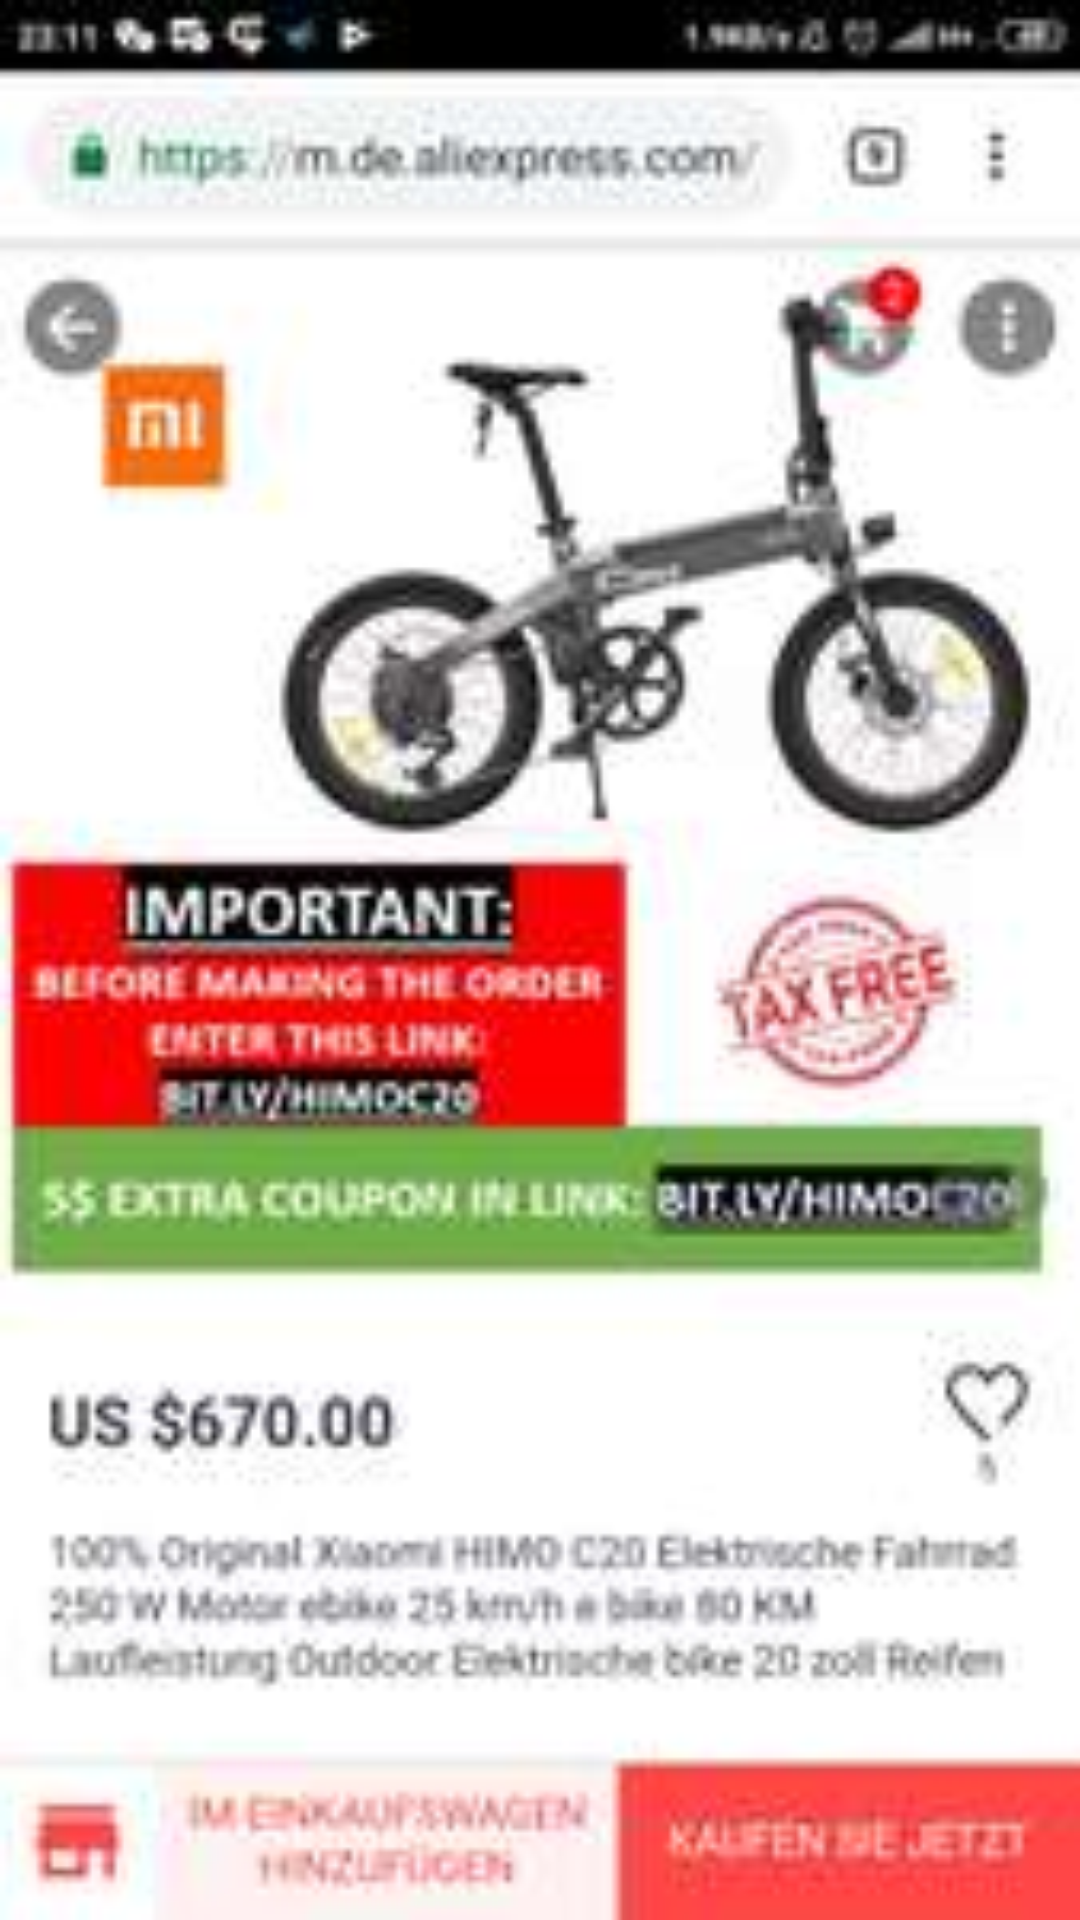 HIMO C20 Falt-e-Bike, Nachfolger von Qicycle EF1, Fahrrad Bike ebike